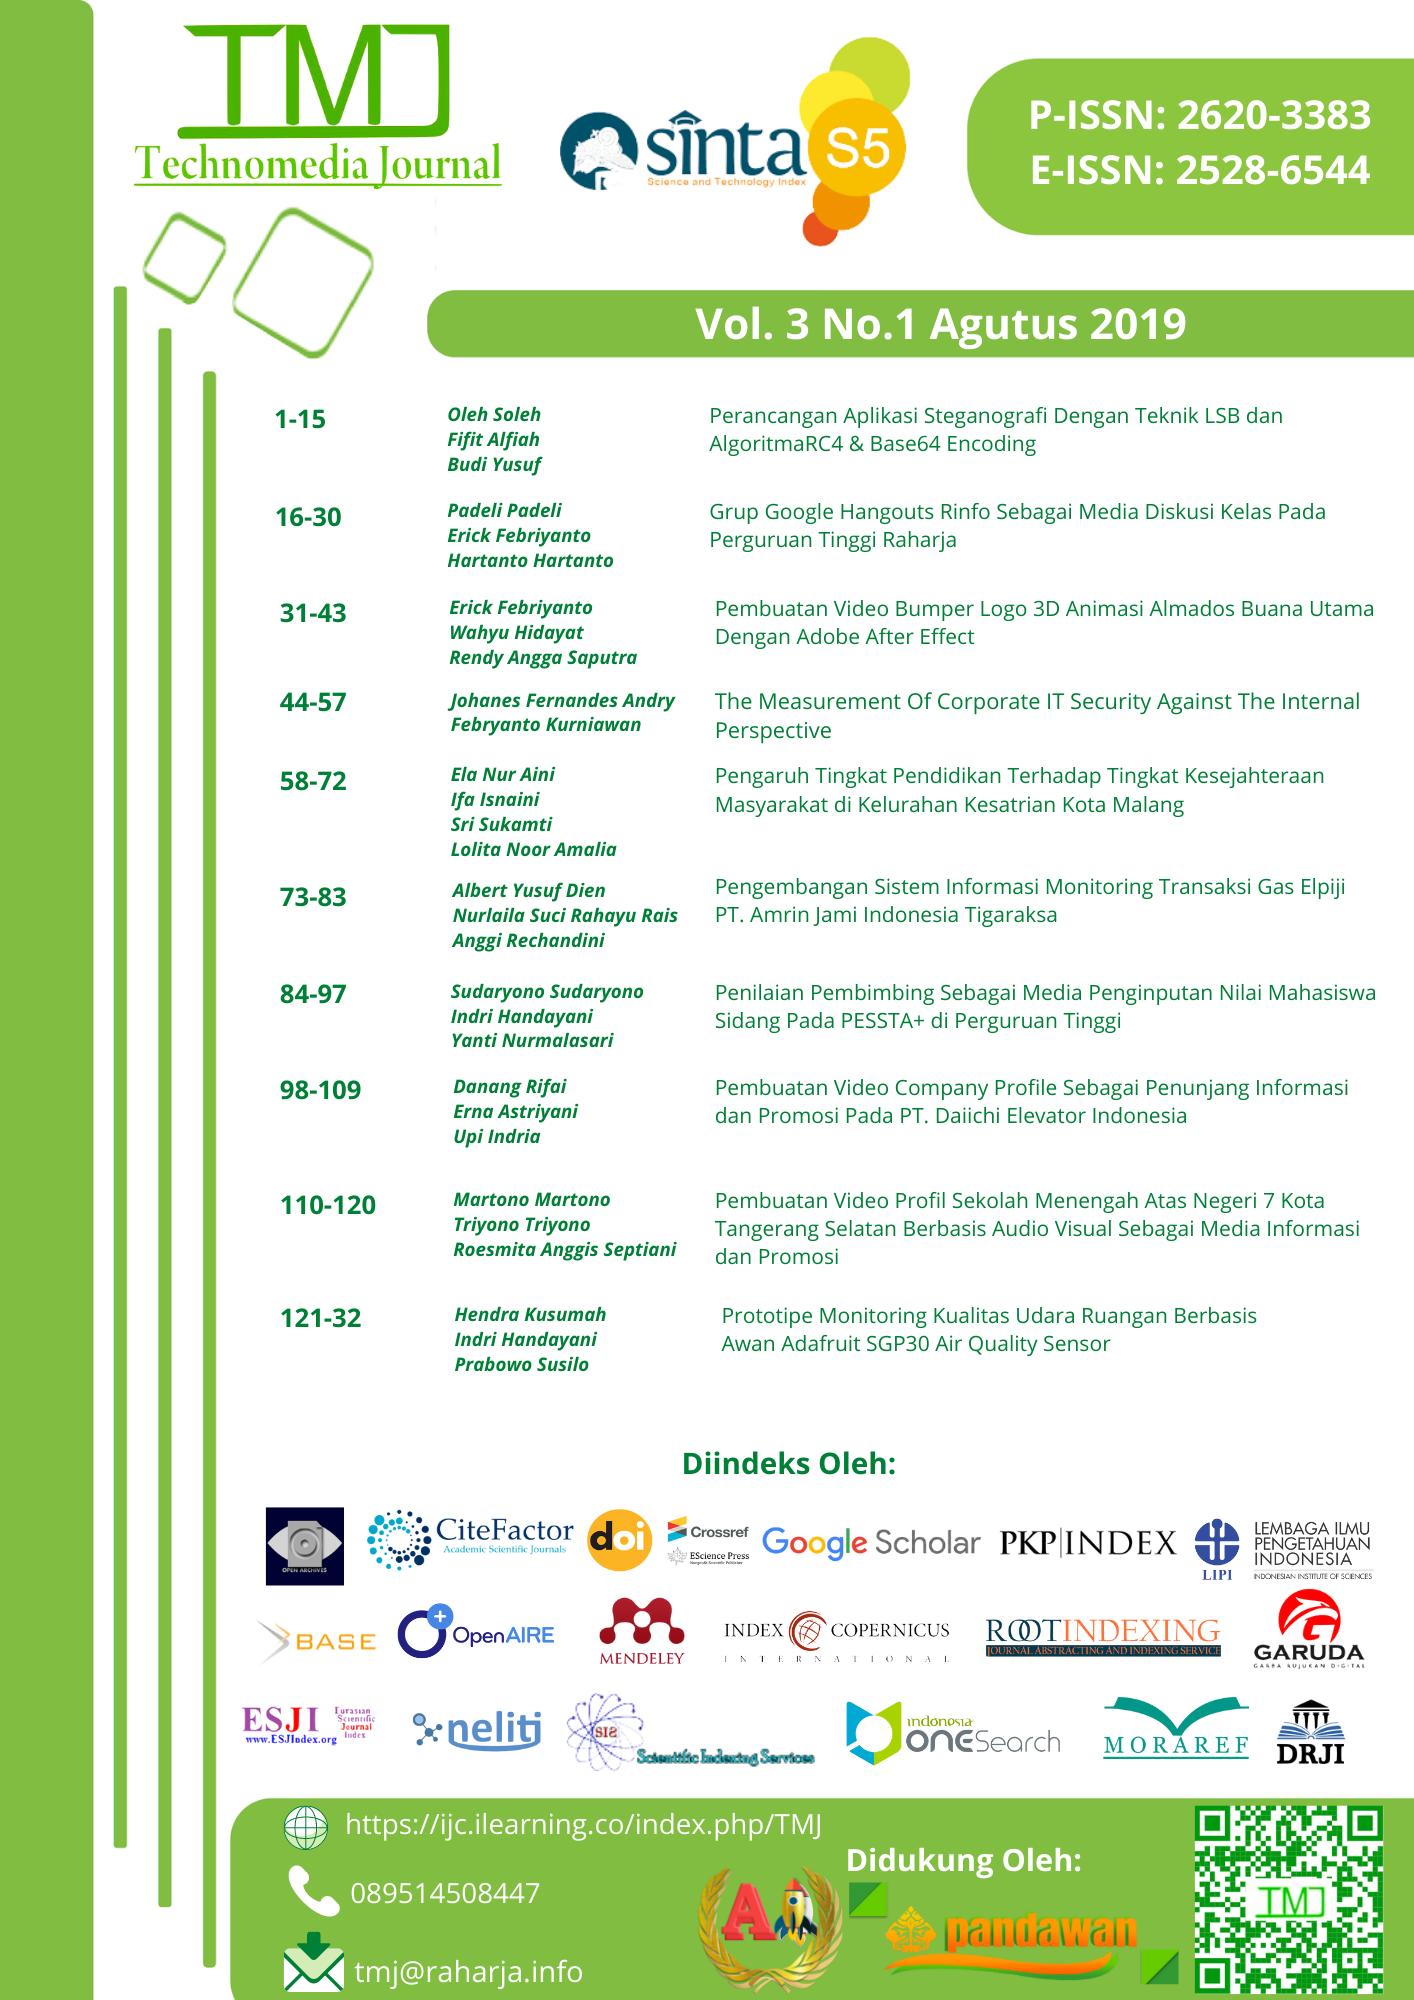 Lihat Vol 3 No 1 Agustus (2018): Technomedia Journal